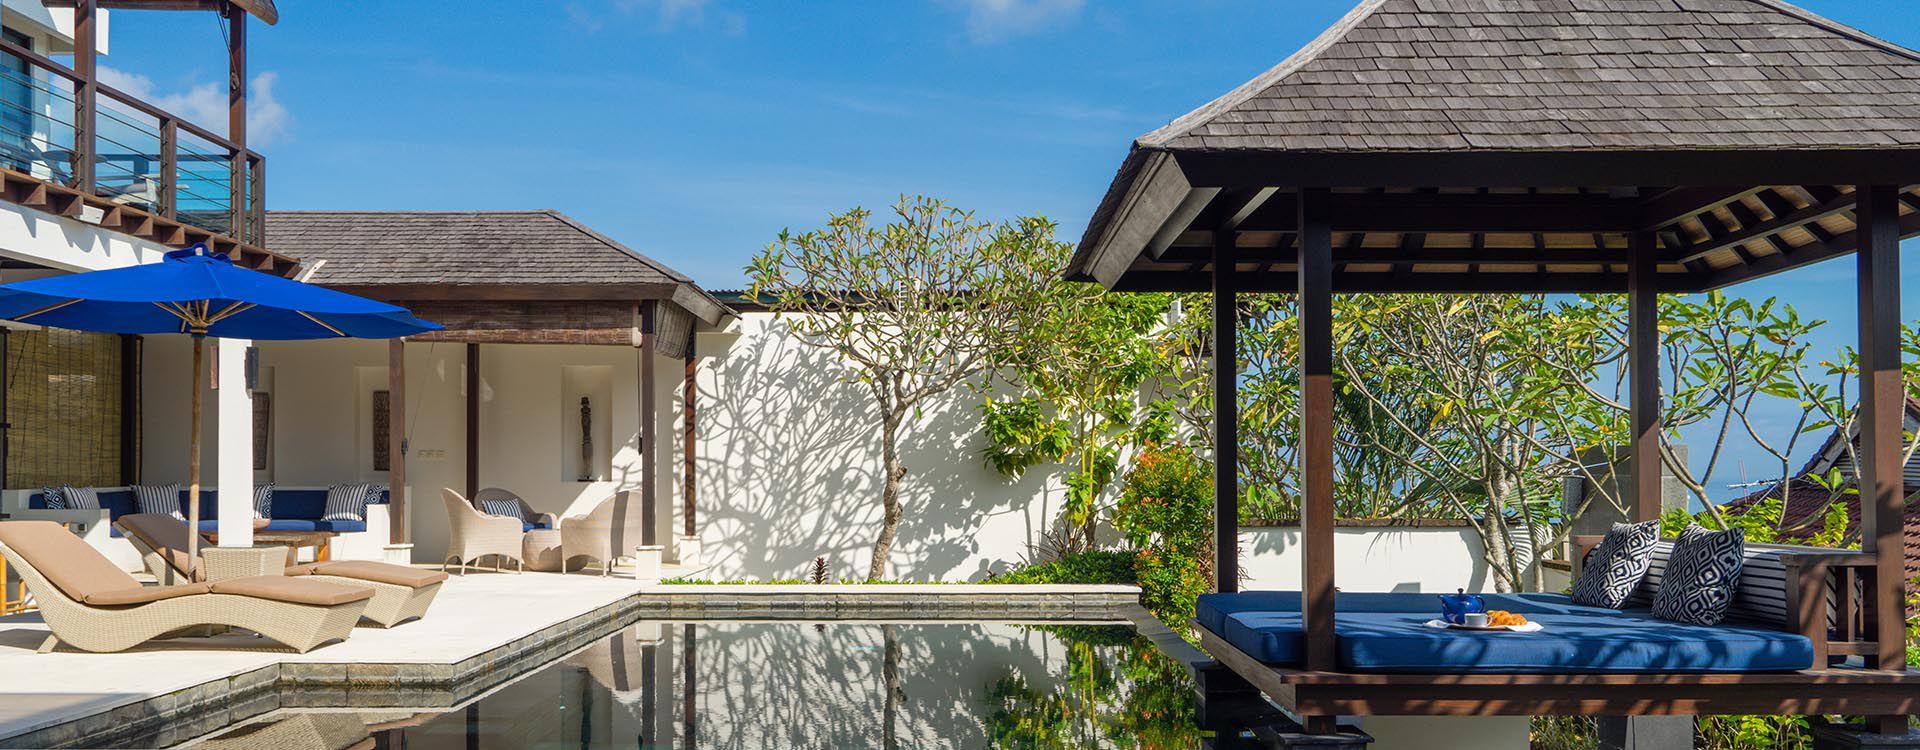 Explore the Villa | Villa Adenium - Jimbaran 4 bedroom luxury villa